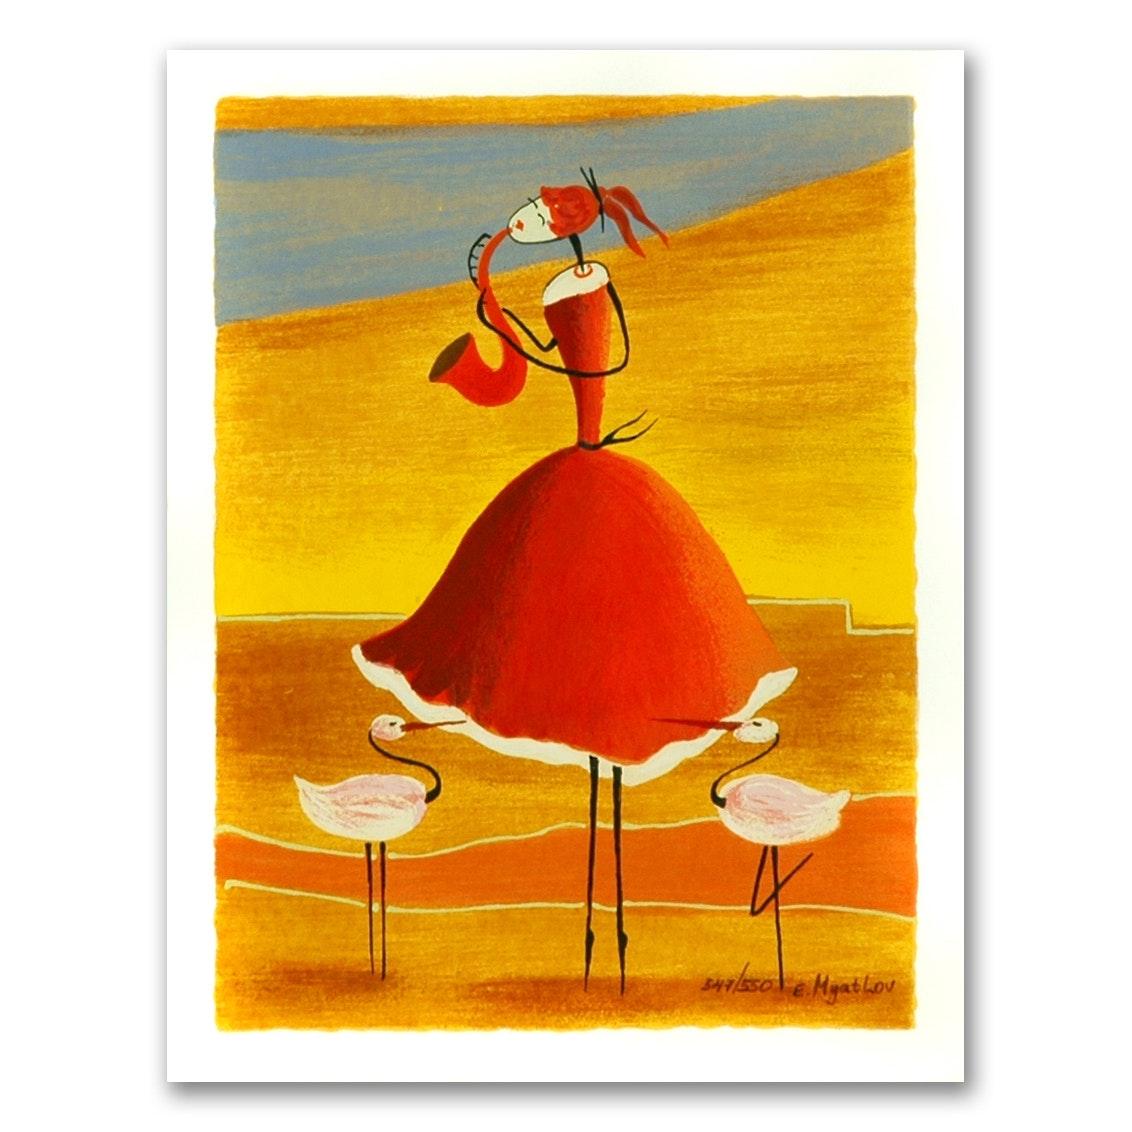 "Ester Myatlov Limited Edition Serigraph on Paper ""Saxophone Girl"""